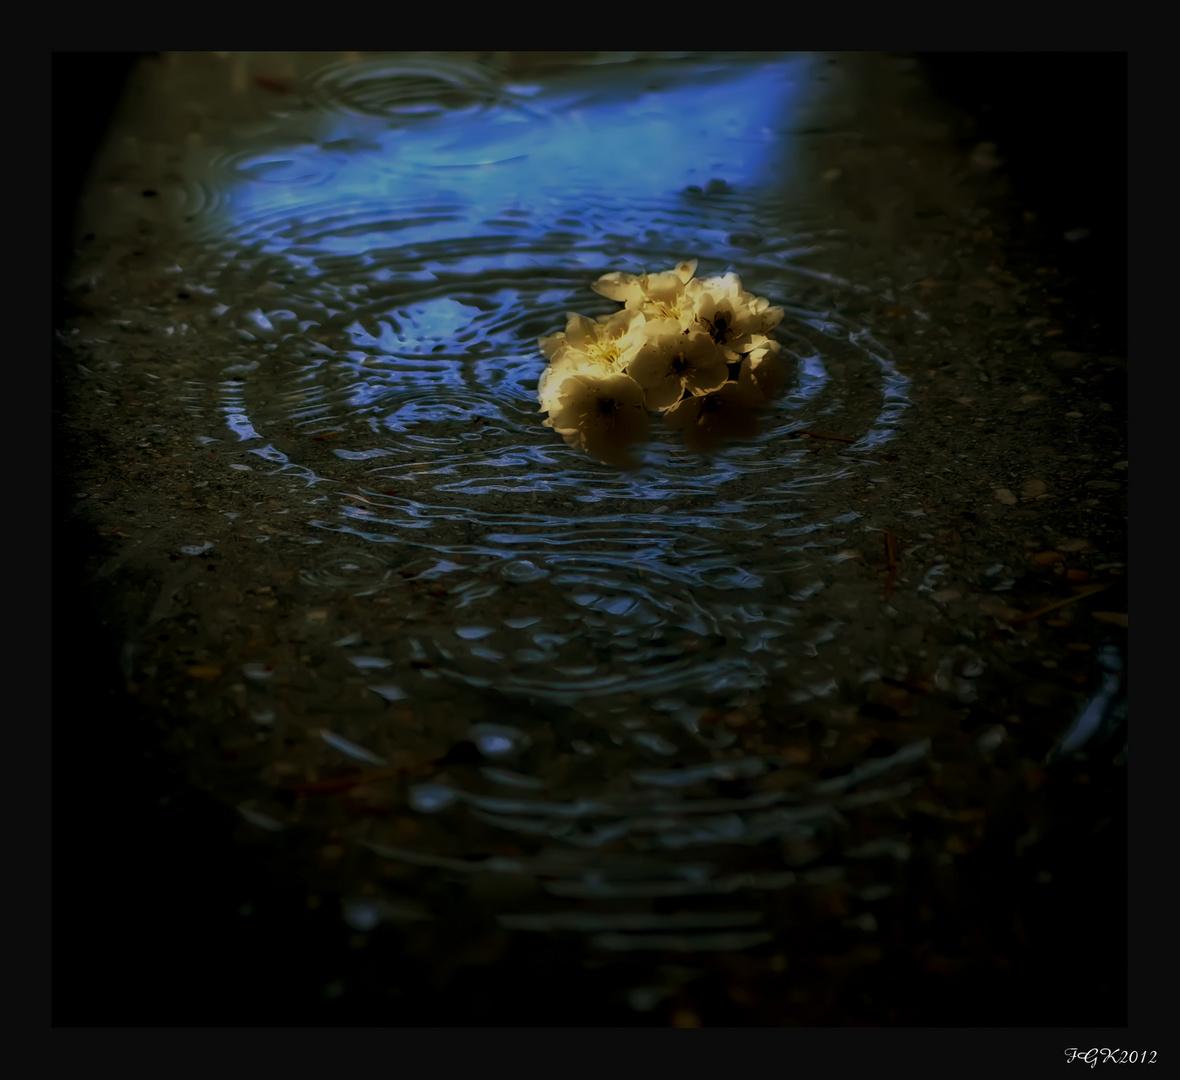 Tus flores en la lluvia( A PuraMariacreativa)